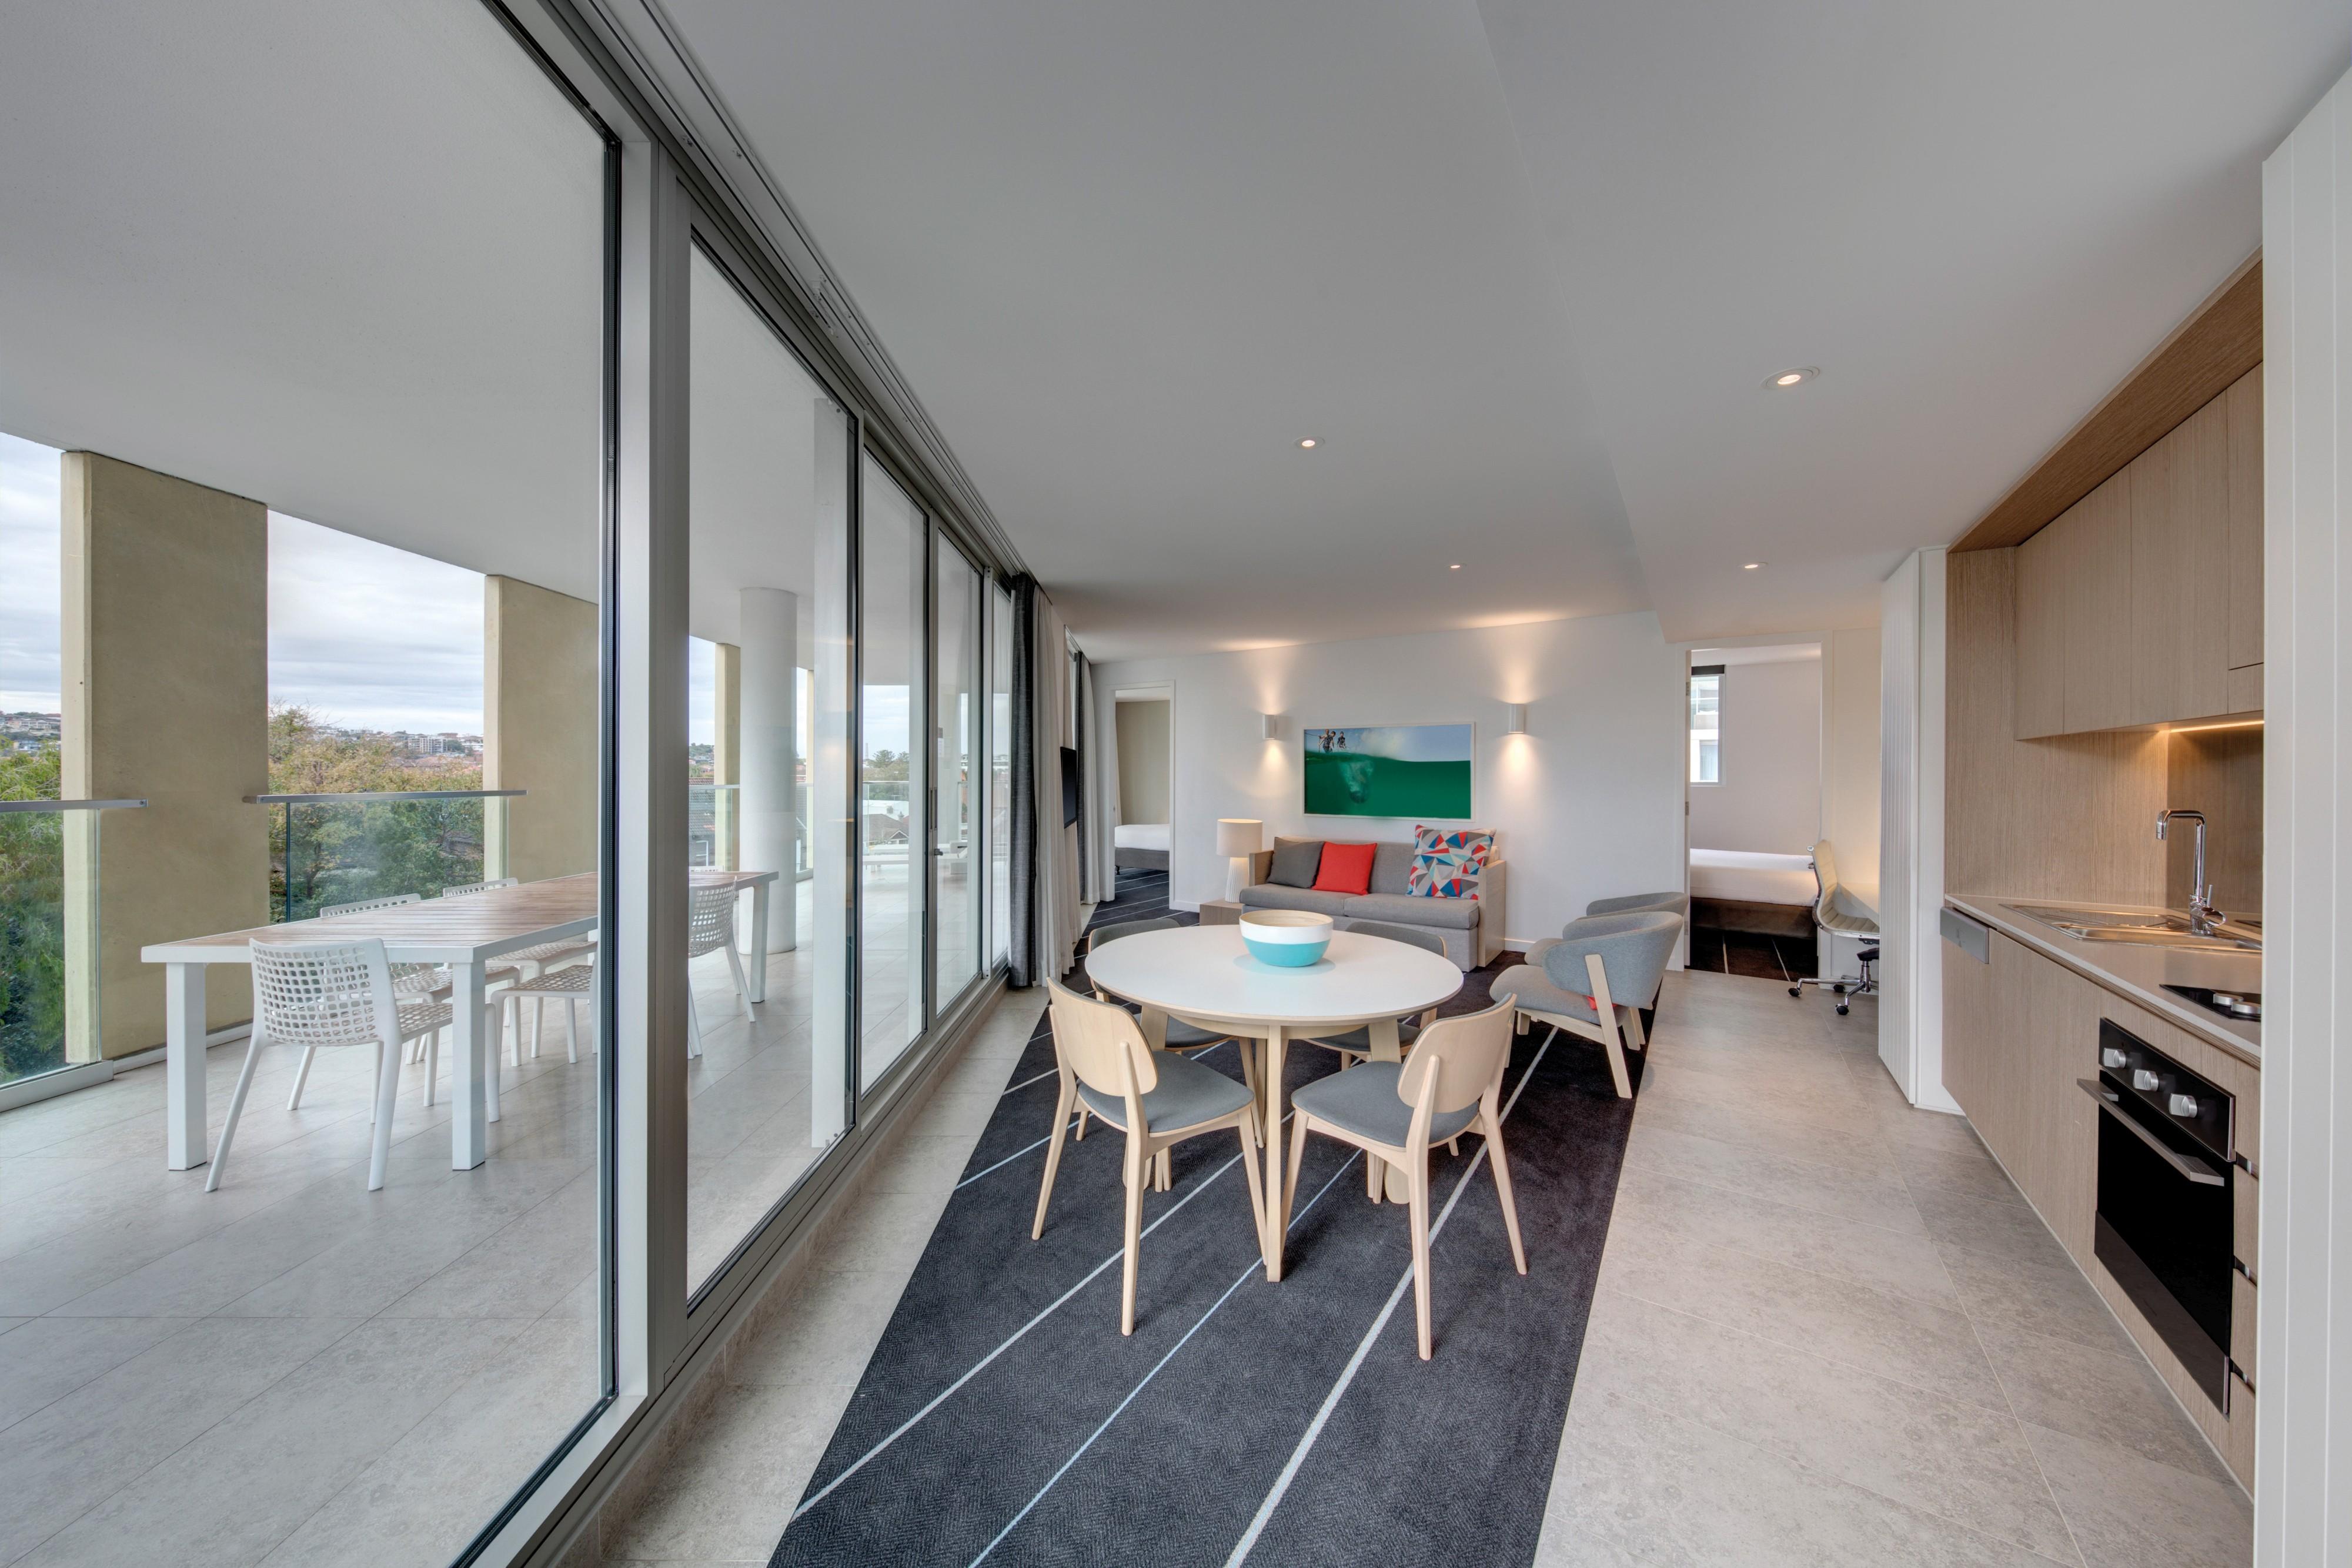 Adina Apartment Hotel Bondi Beach Sydney | 69-73 Hall, Bondi Beach, New South Wales 2026 | +61 2 9300 4800